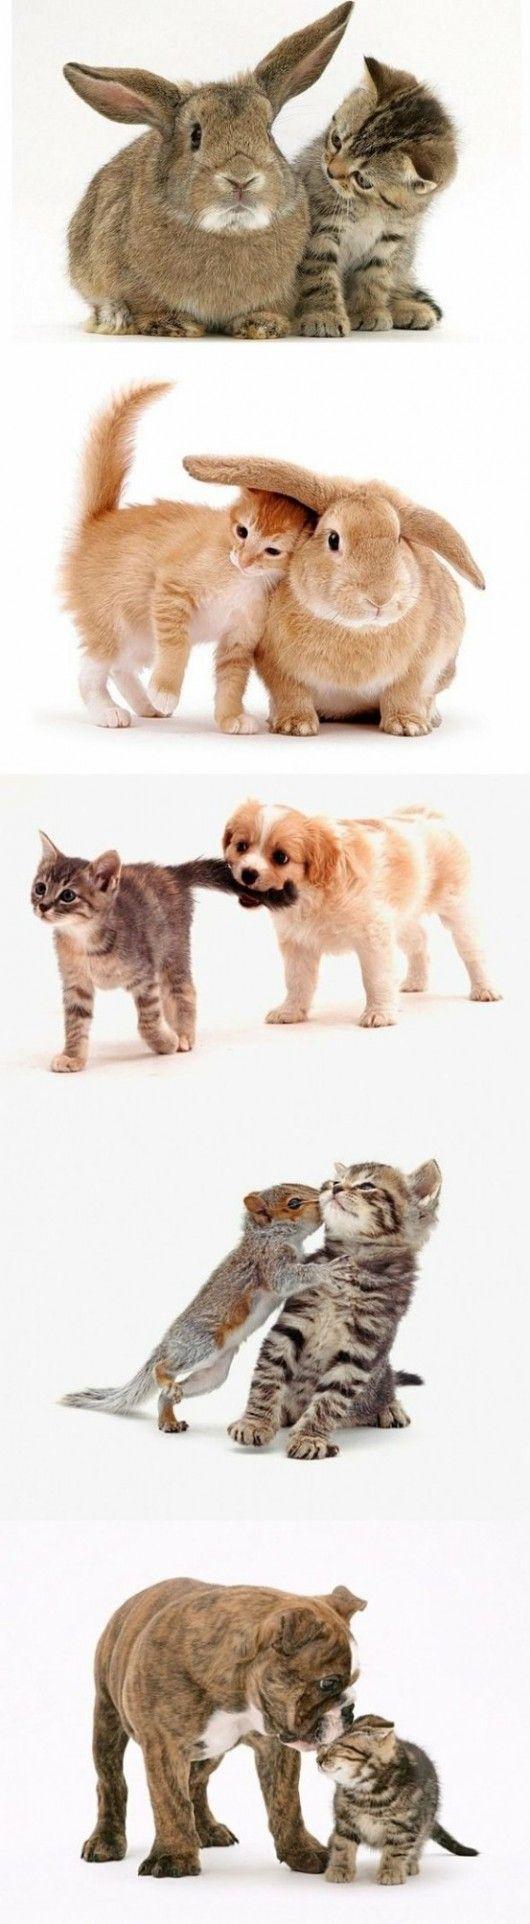 Baby animal love!Cat, Animal Baby, Pets, Cute Animals, Animal Friends, Kittens, Baby Animals, Furries Friends, Kitty